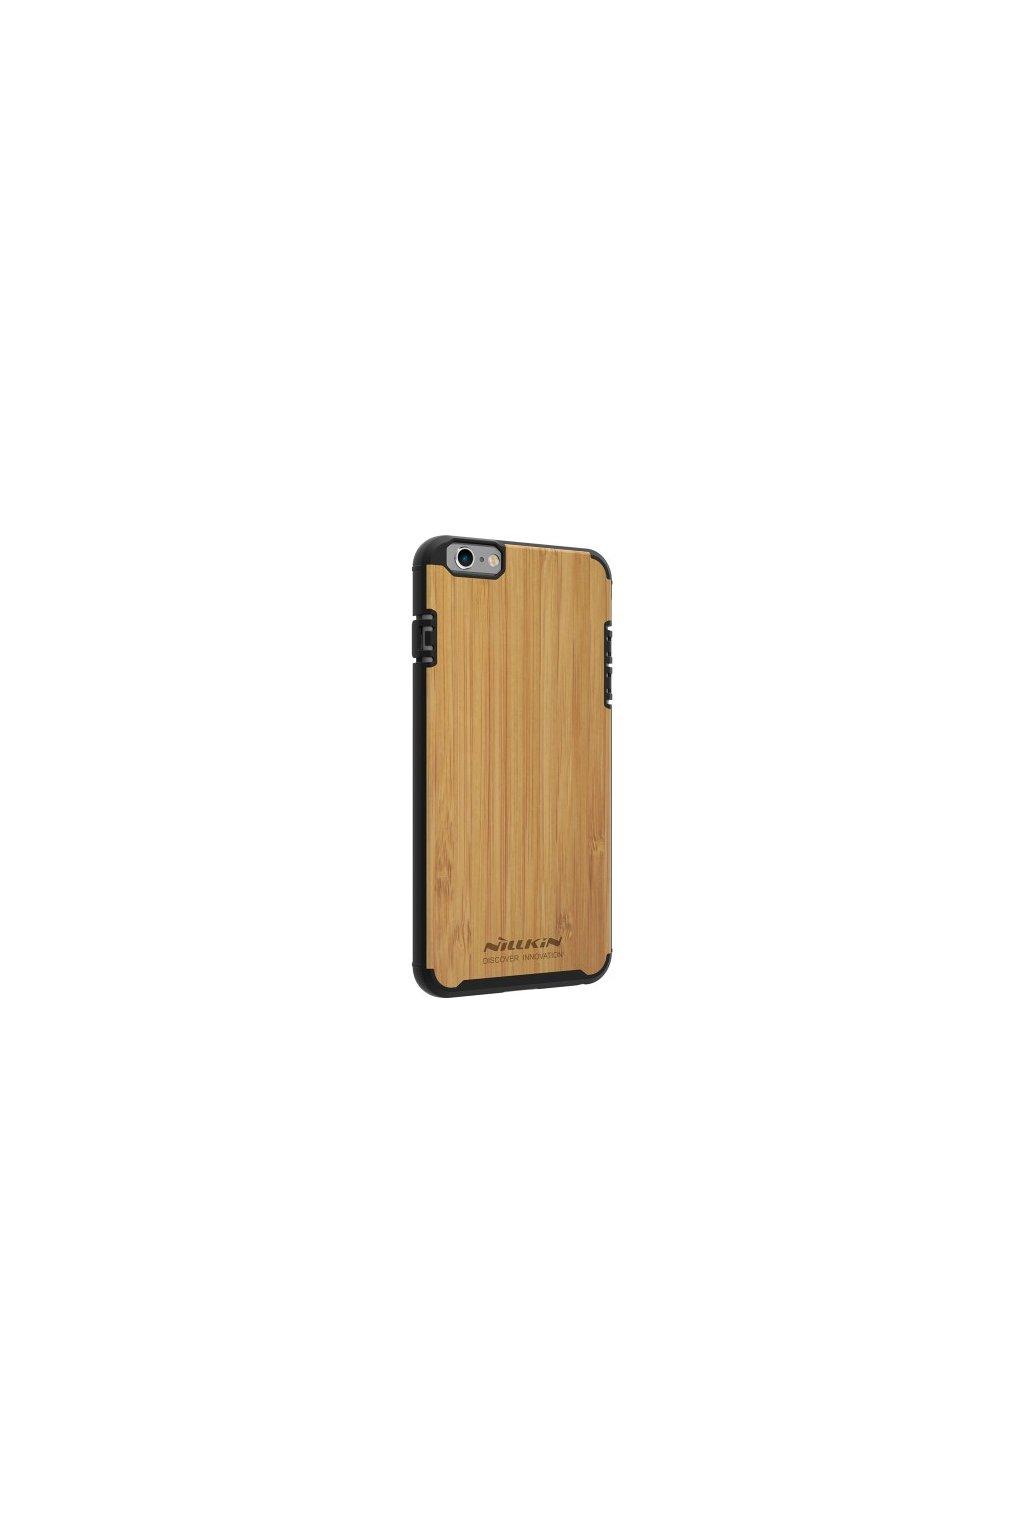 Pouzdro Nilllkin Bamboo Apple iPhone 6/6S, black